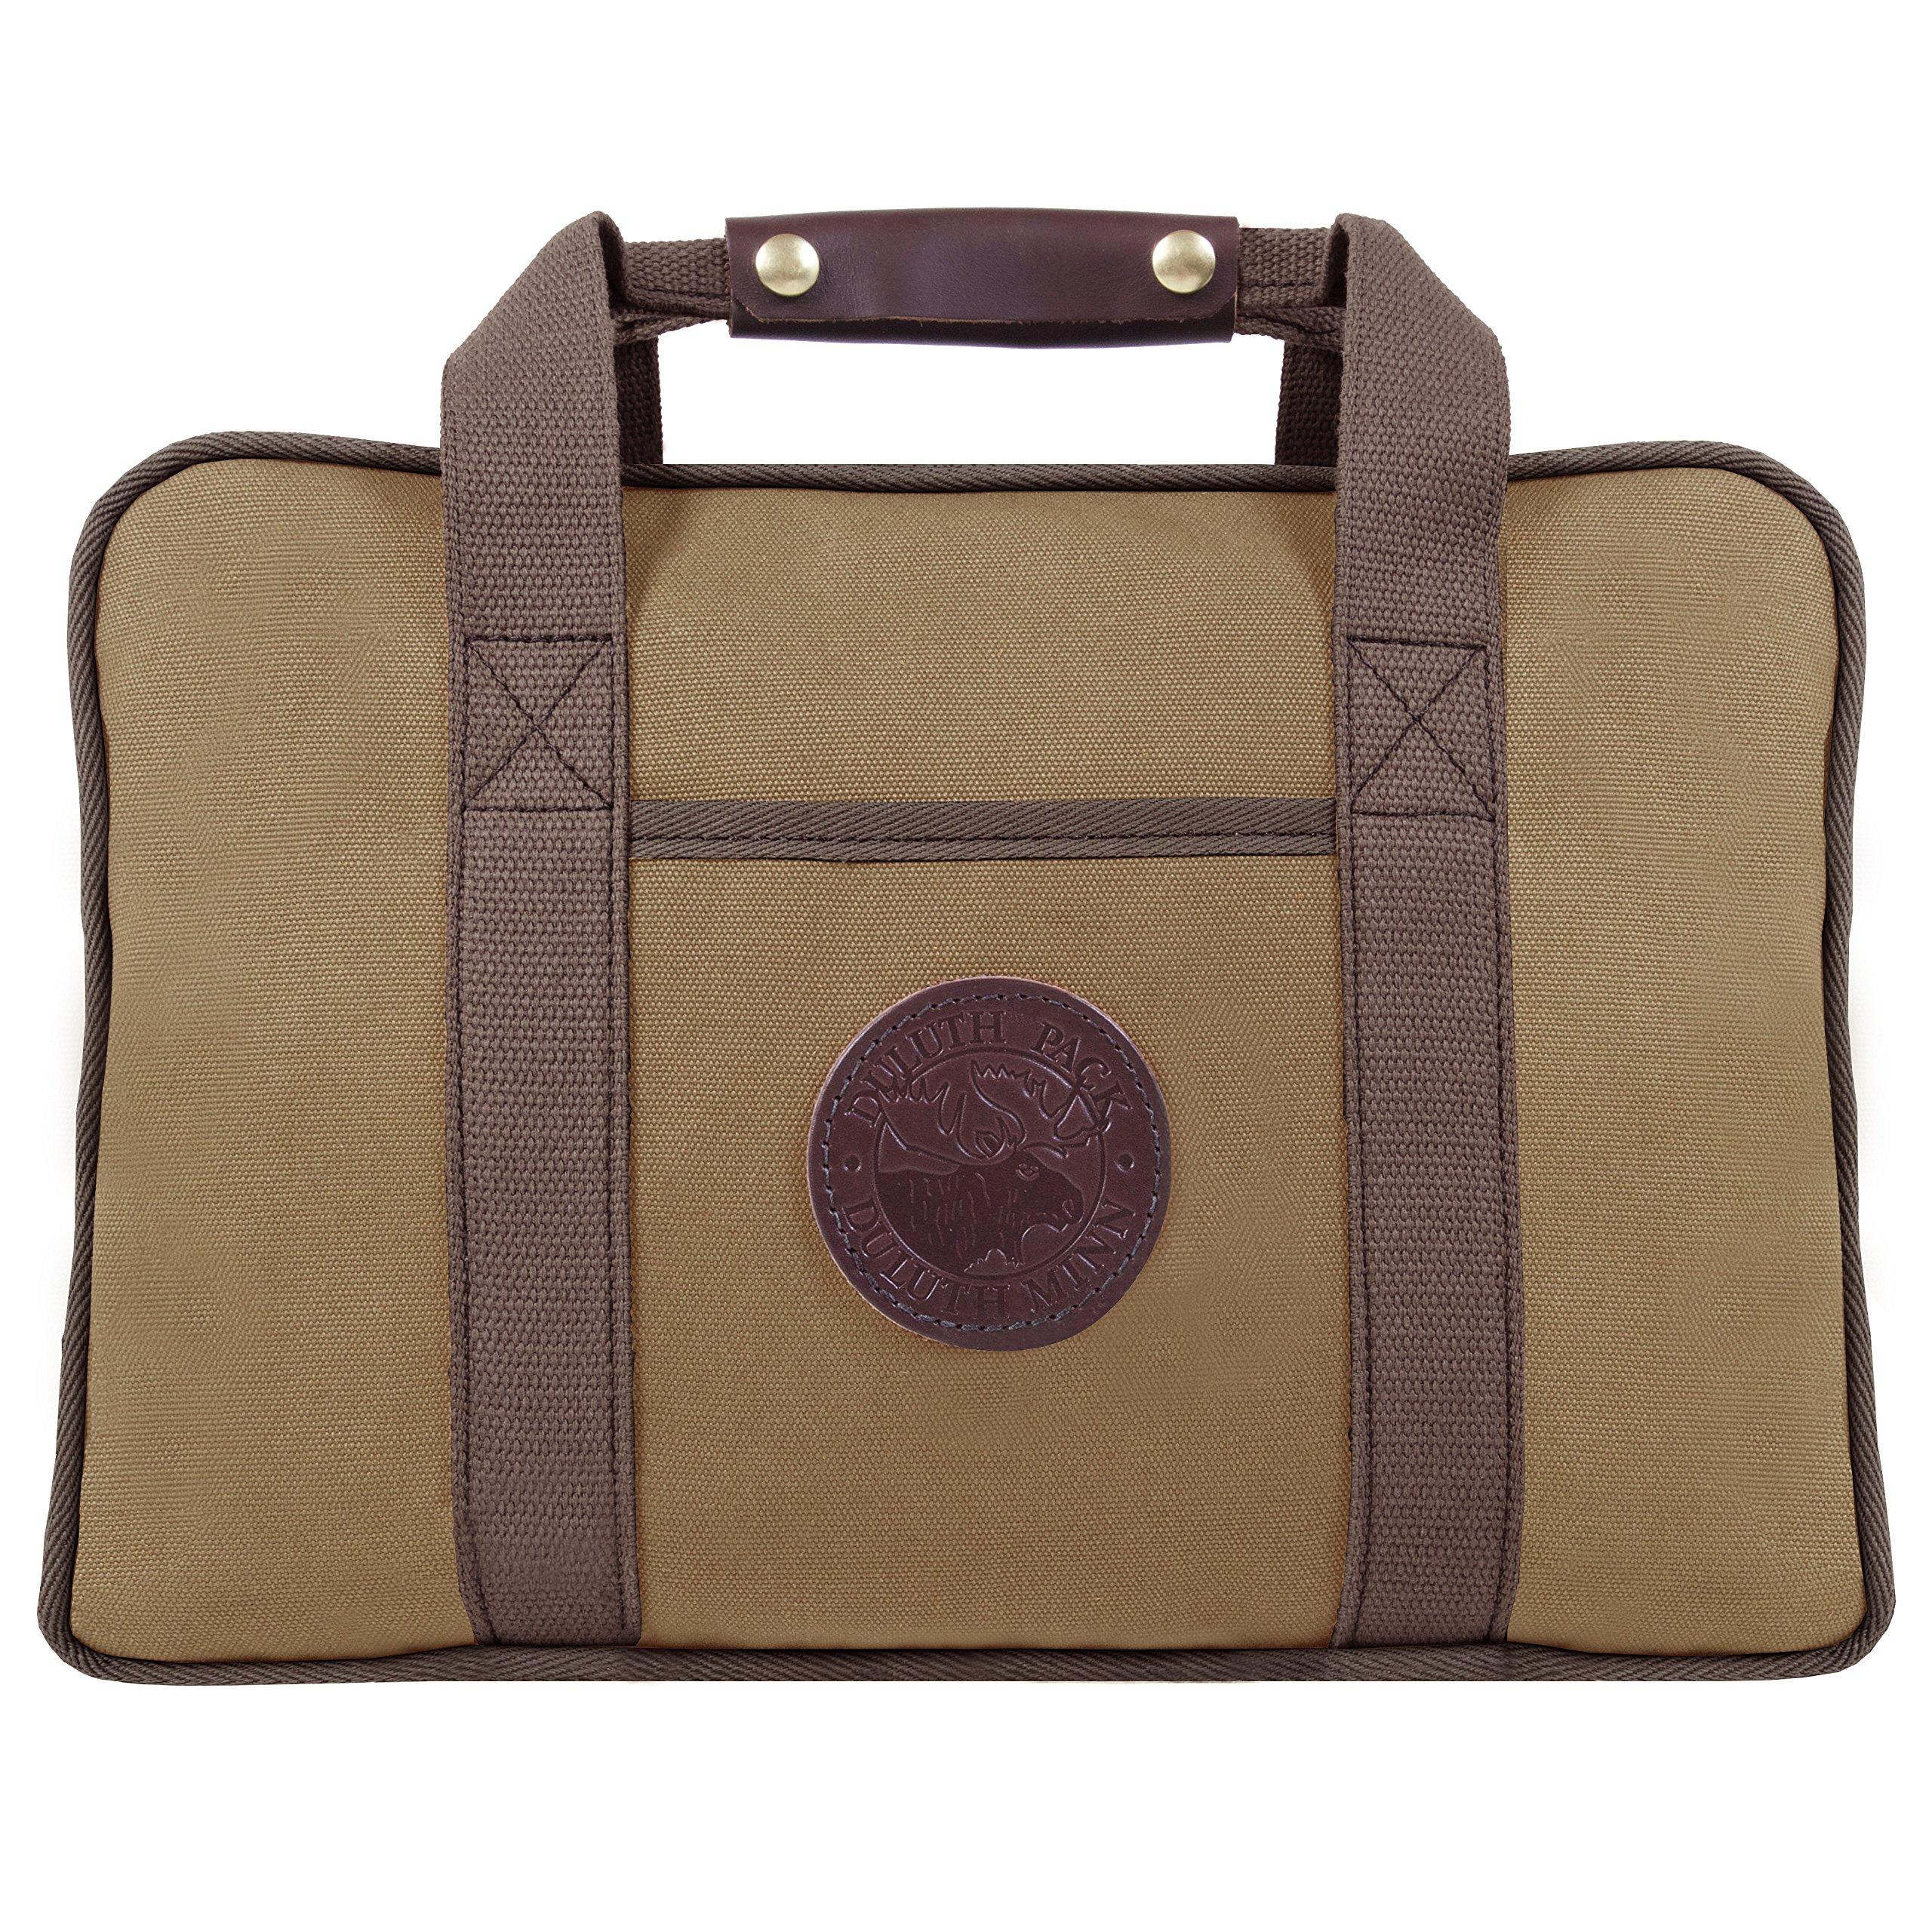 Duluth Pack Safari Portfolio Briefcase, Tan, 11 x 16 x 4-Inch